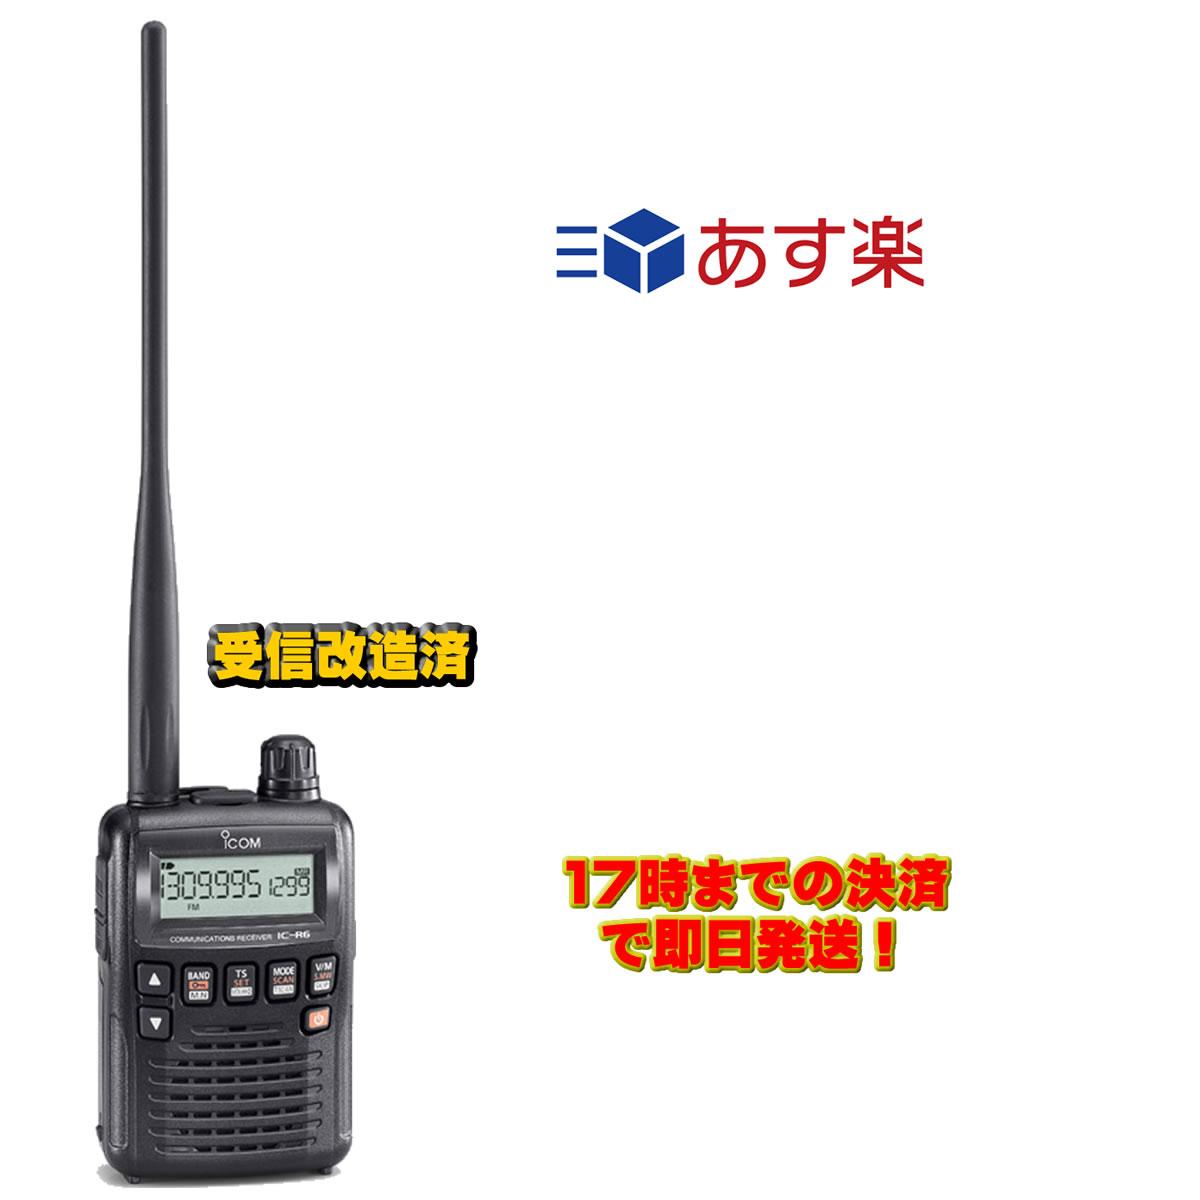 IC-R6 アイコム 広帯域ハンディレシーバー 受信改造済